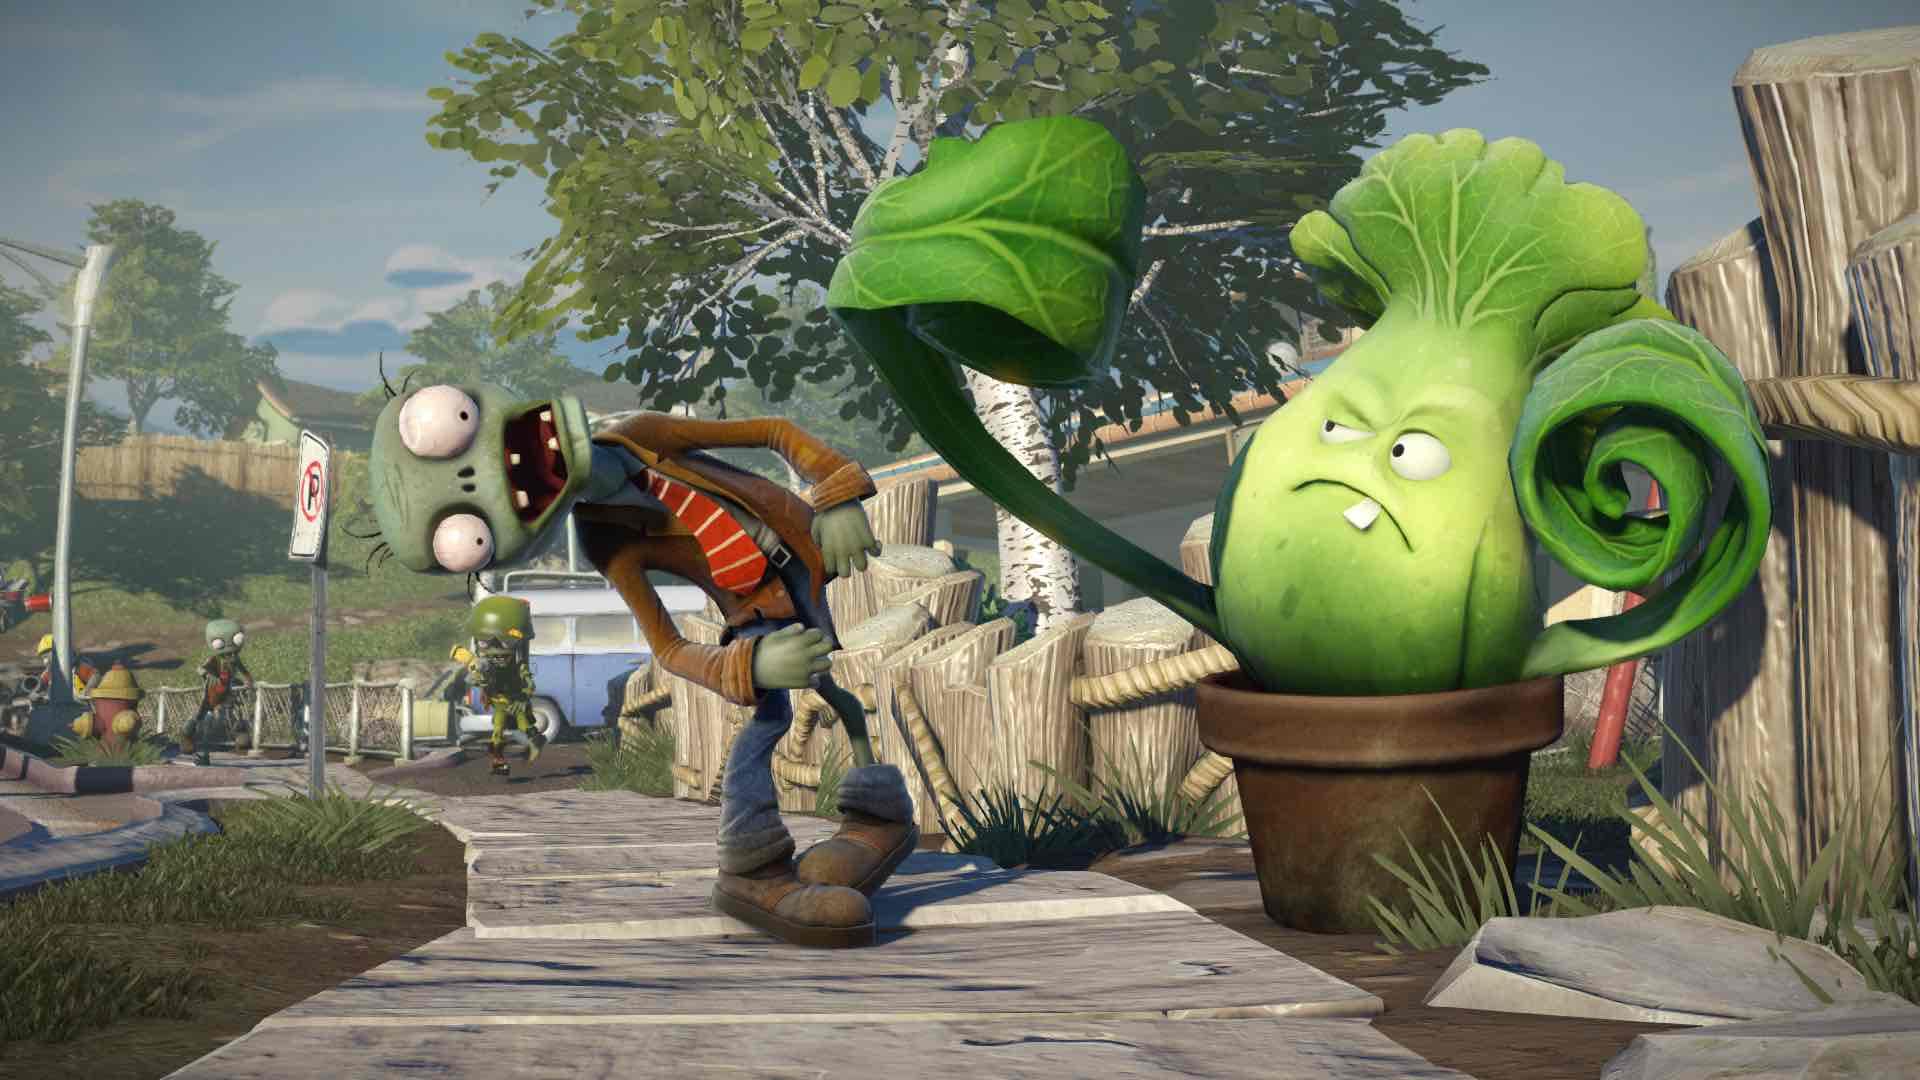 Plants Vs Zombies Garden Warfare Full Game Free Pc Download